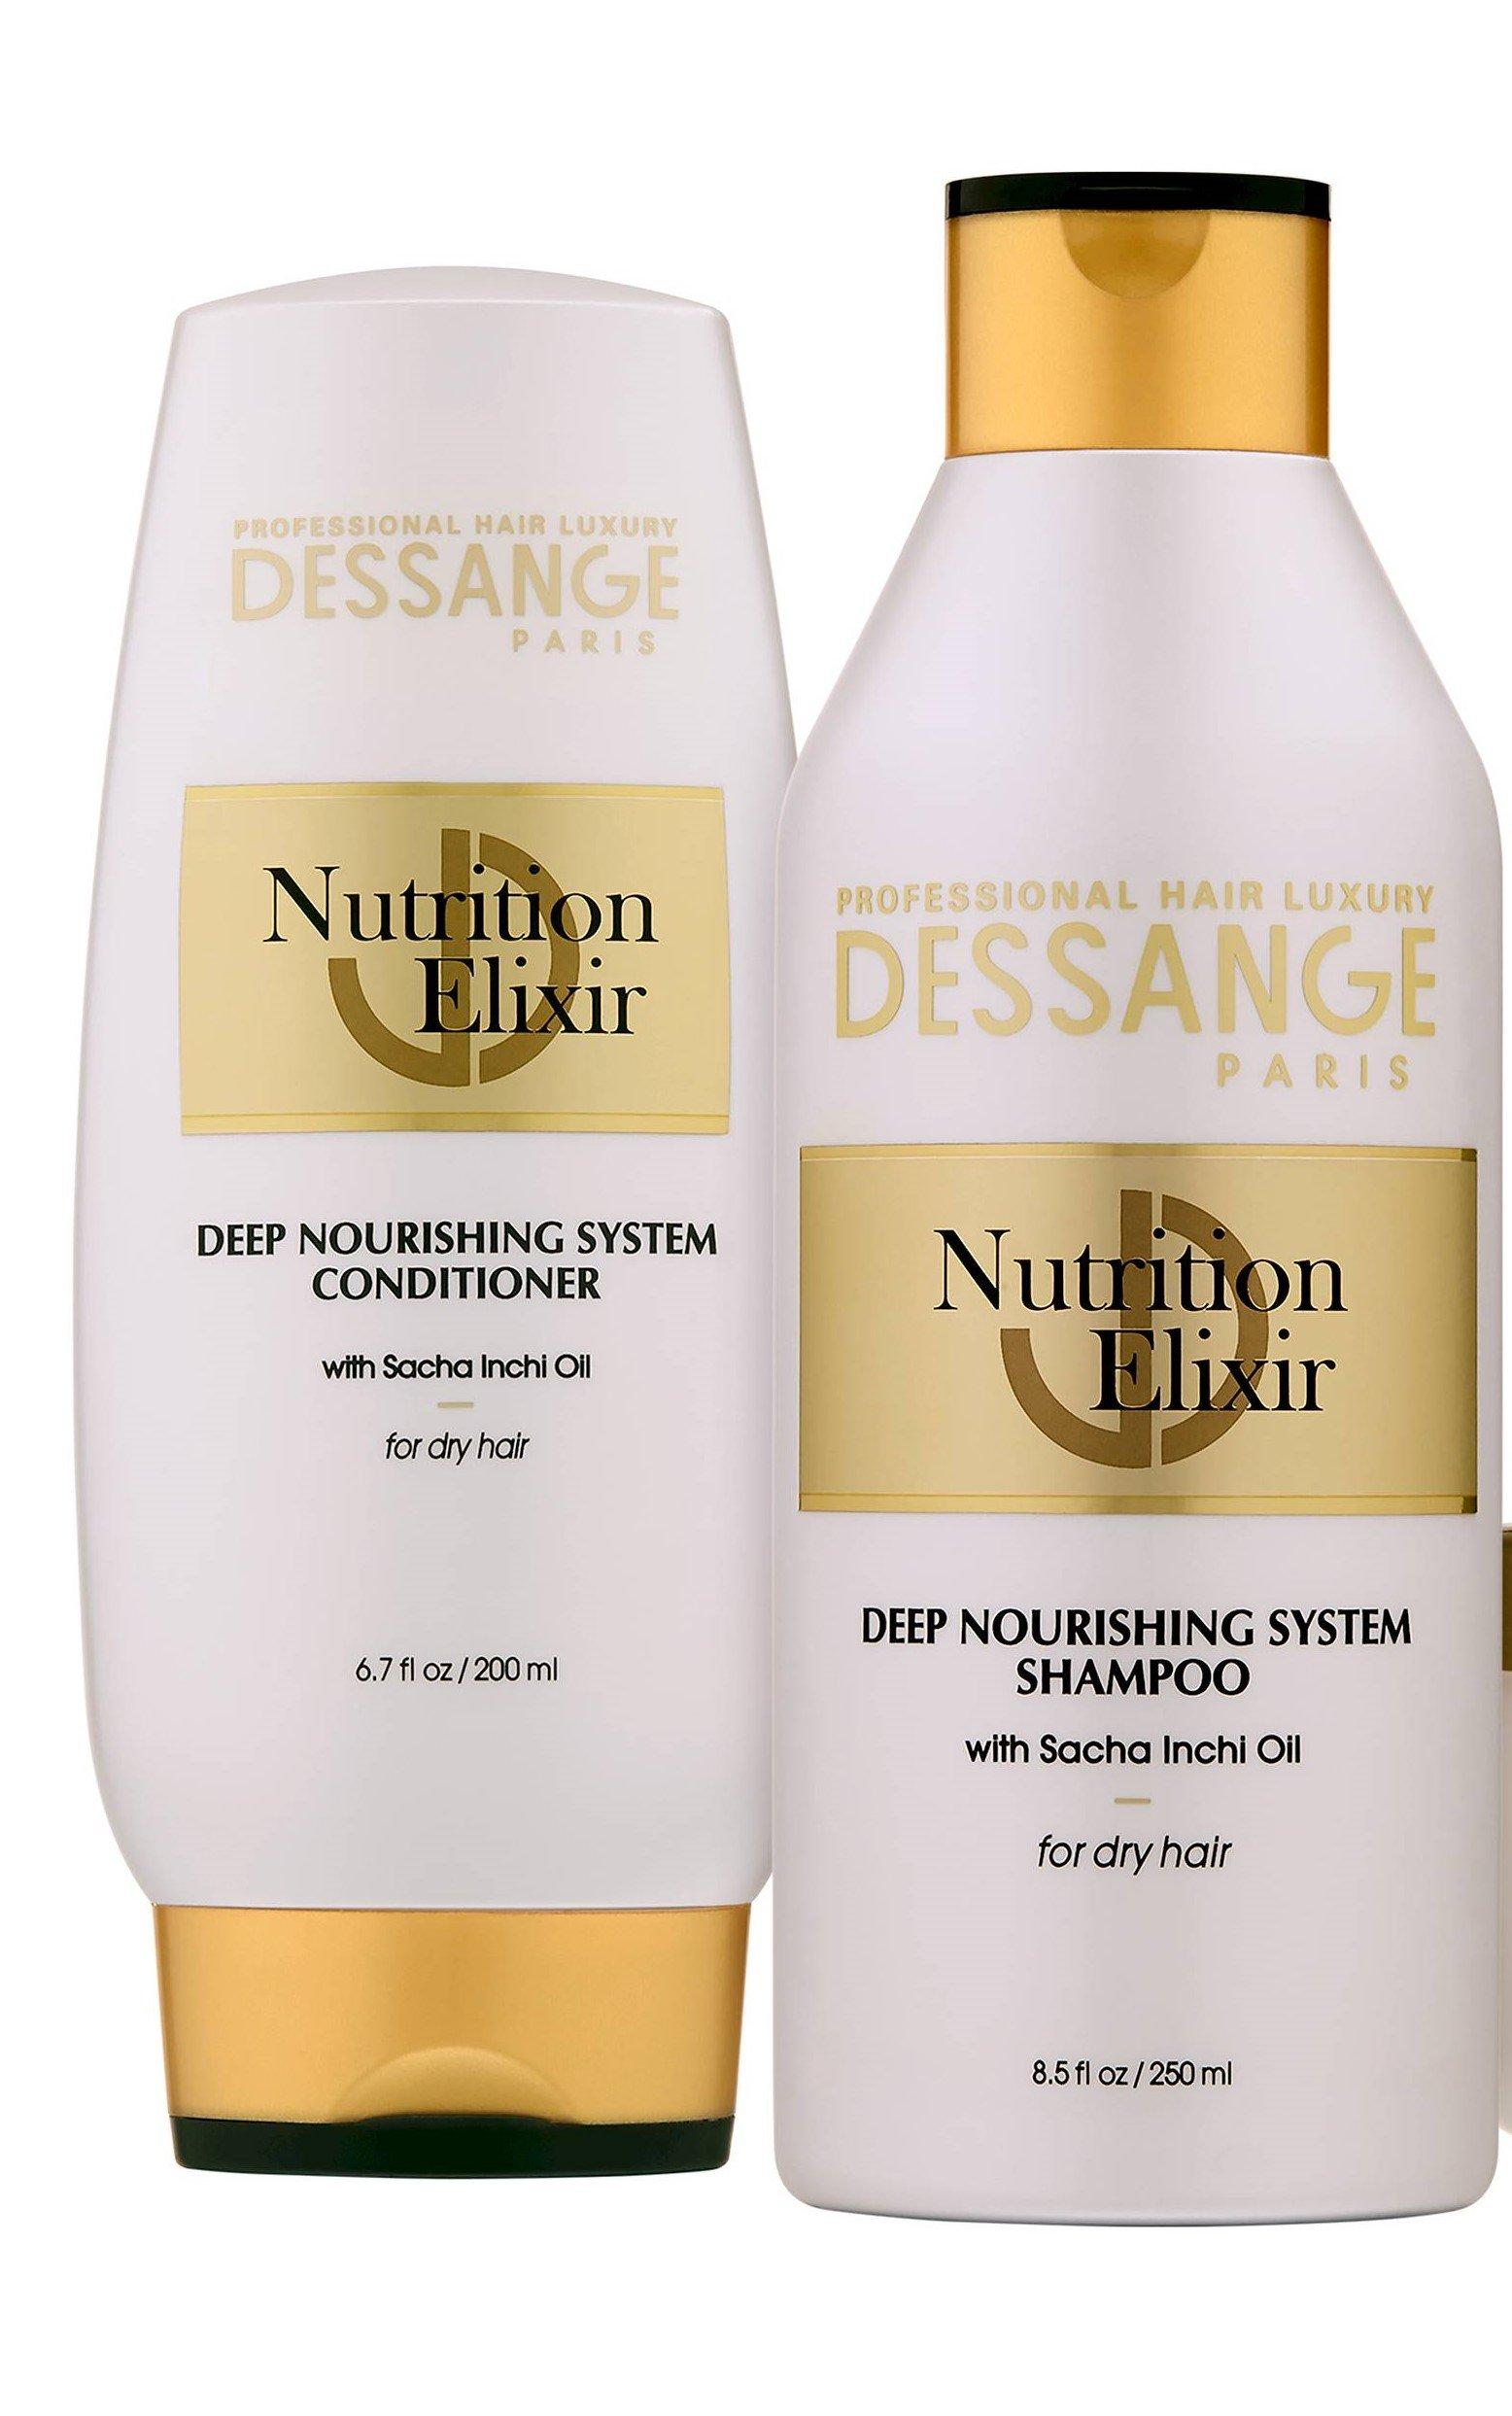 Dessange Paris Nutrition Elixir Deep Nourishing System Shampoo 8.5 Oz & Conditioner- 6.7oz